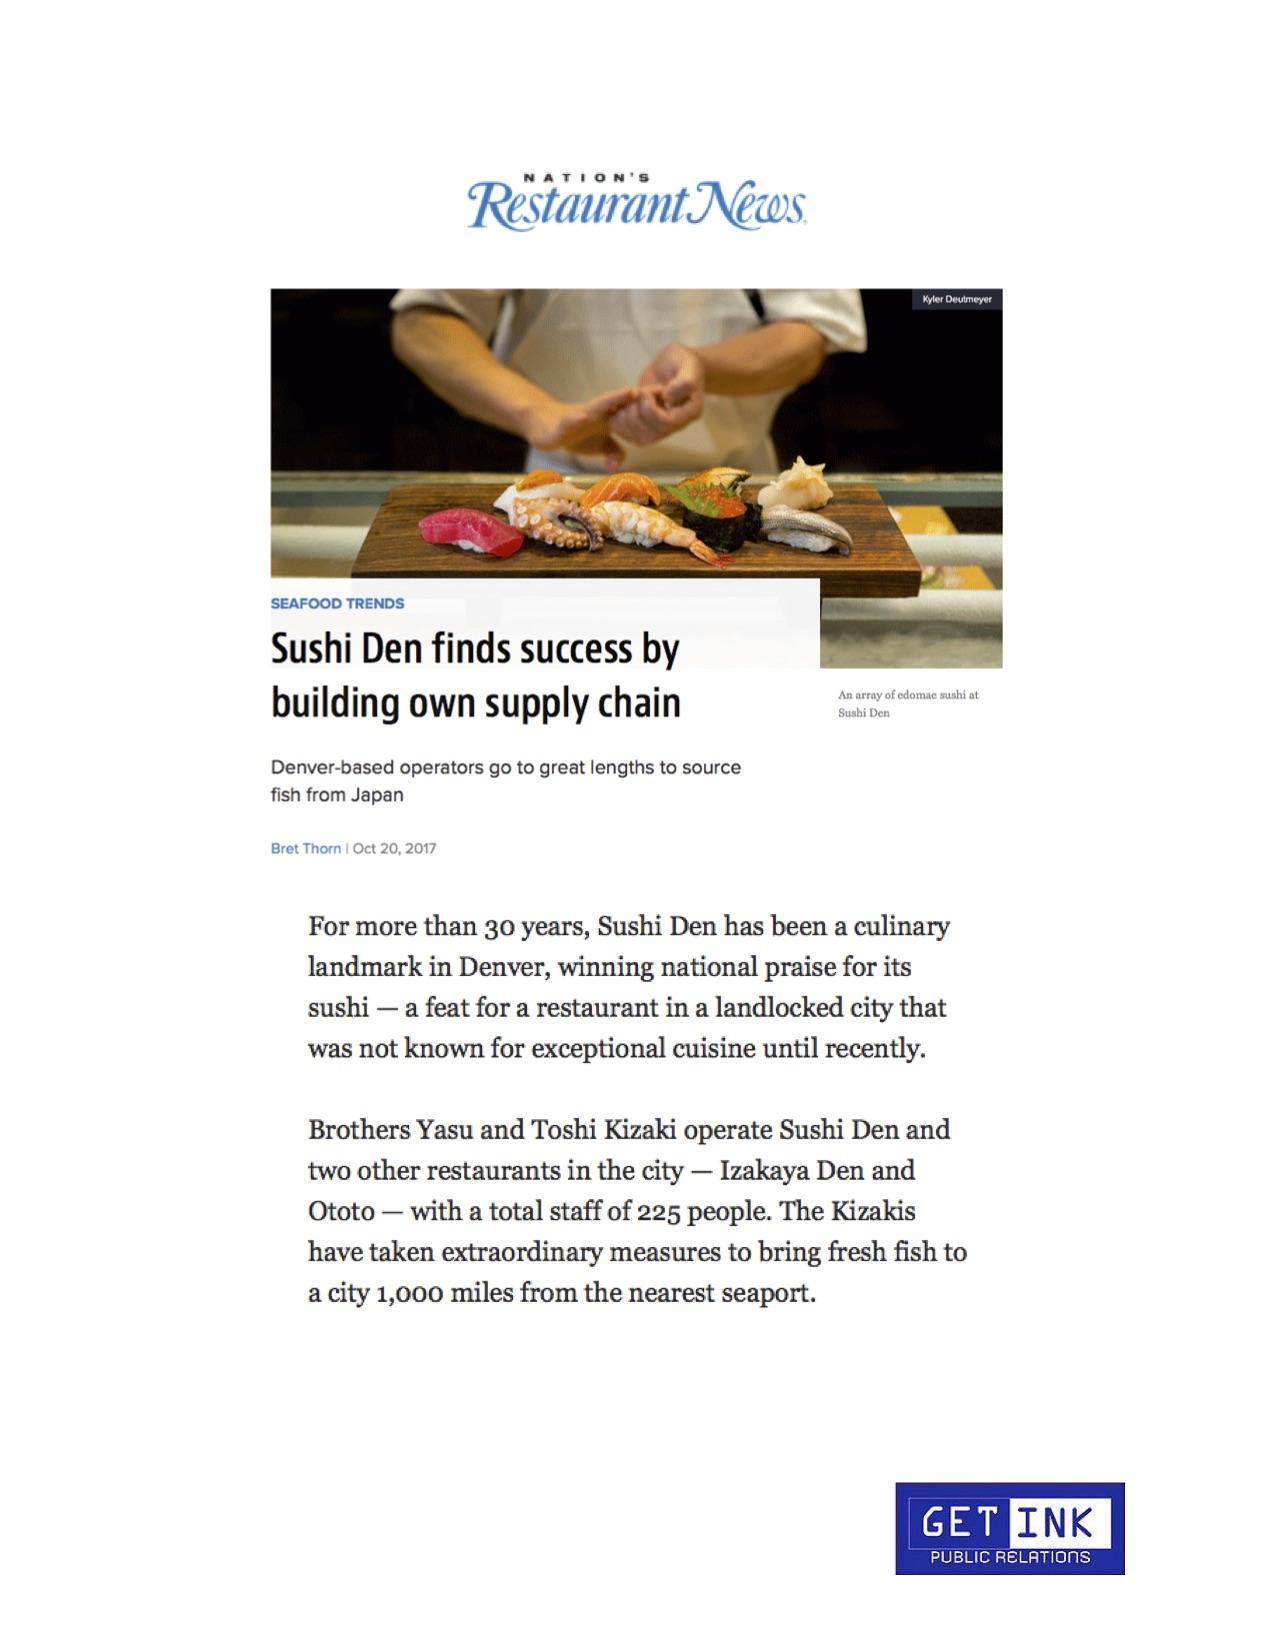 DenCorner.RestaurantNews.10.20.17.